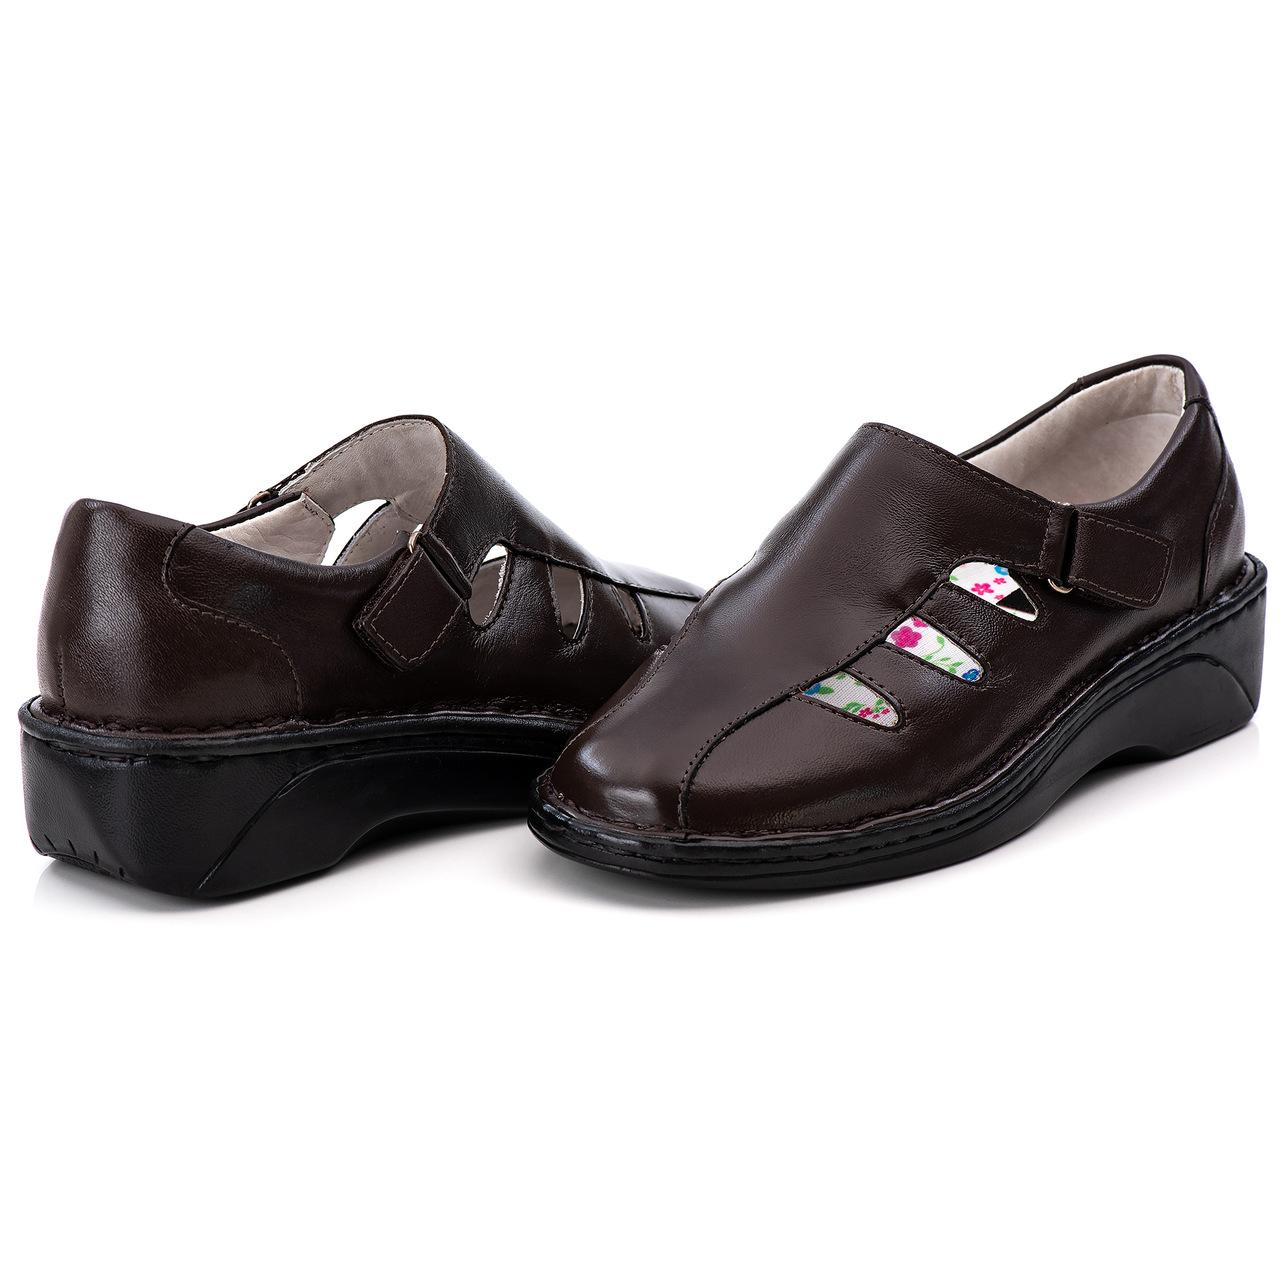 Sapato Antstress Feminino em Couro Legitimo F-230